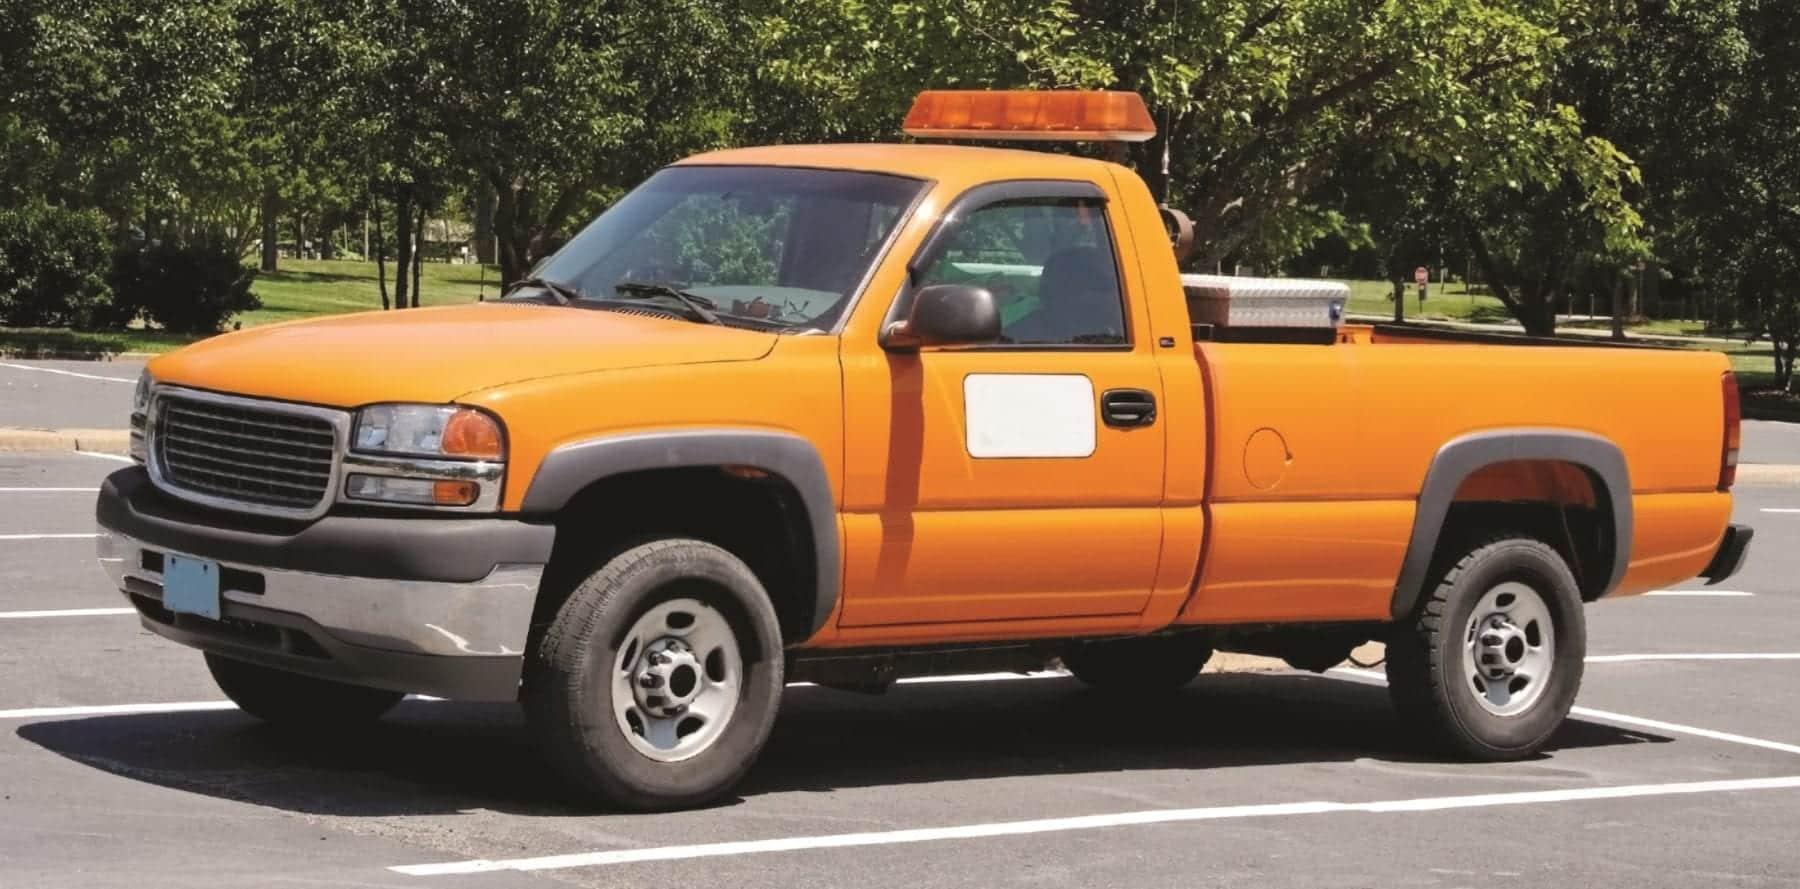 Orange department of transportation utility pickup truck.